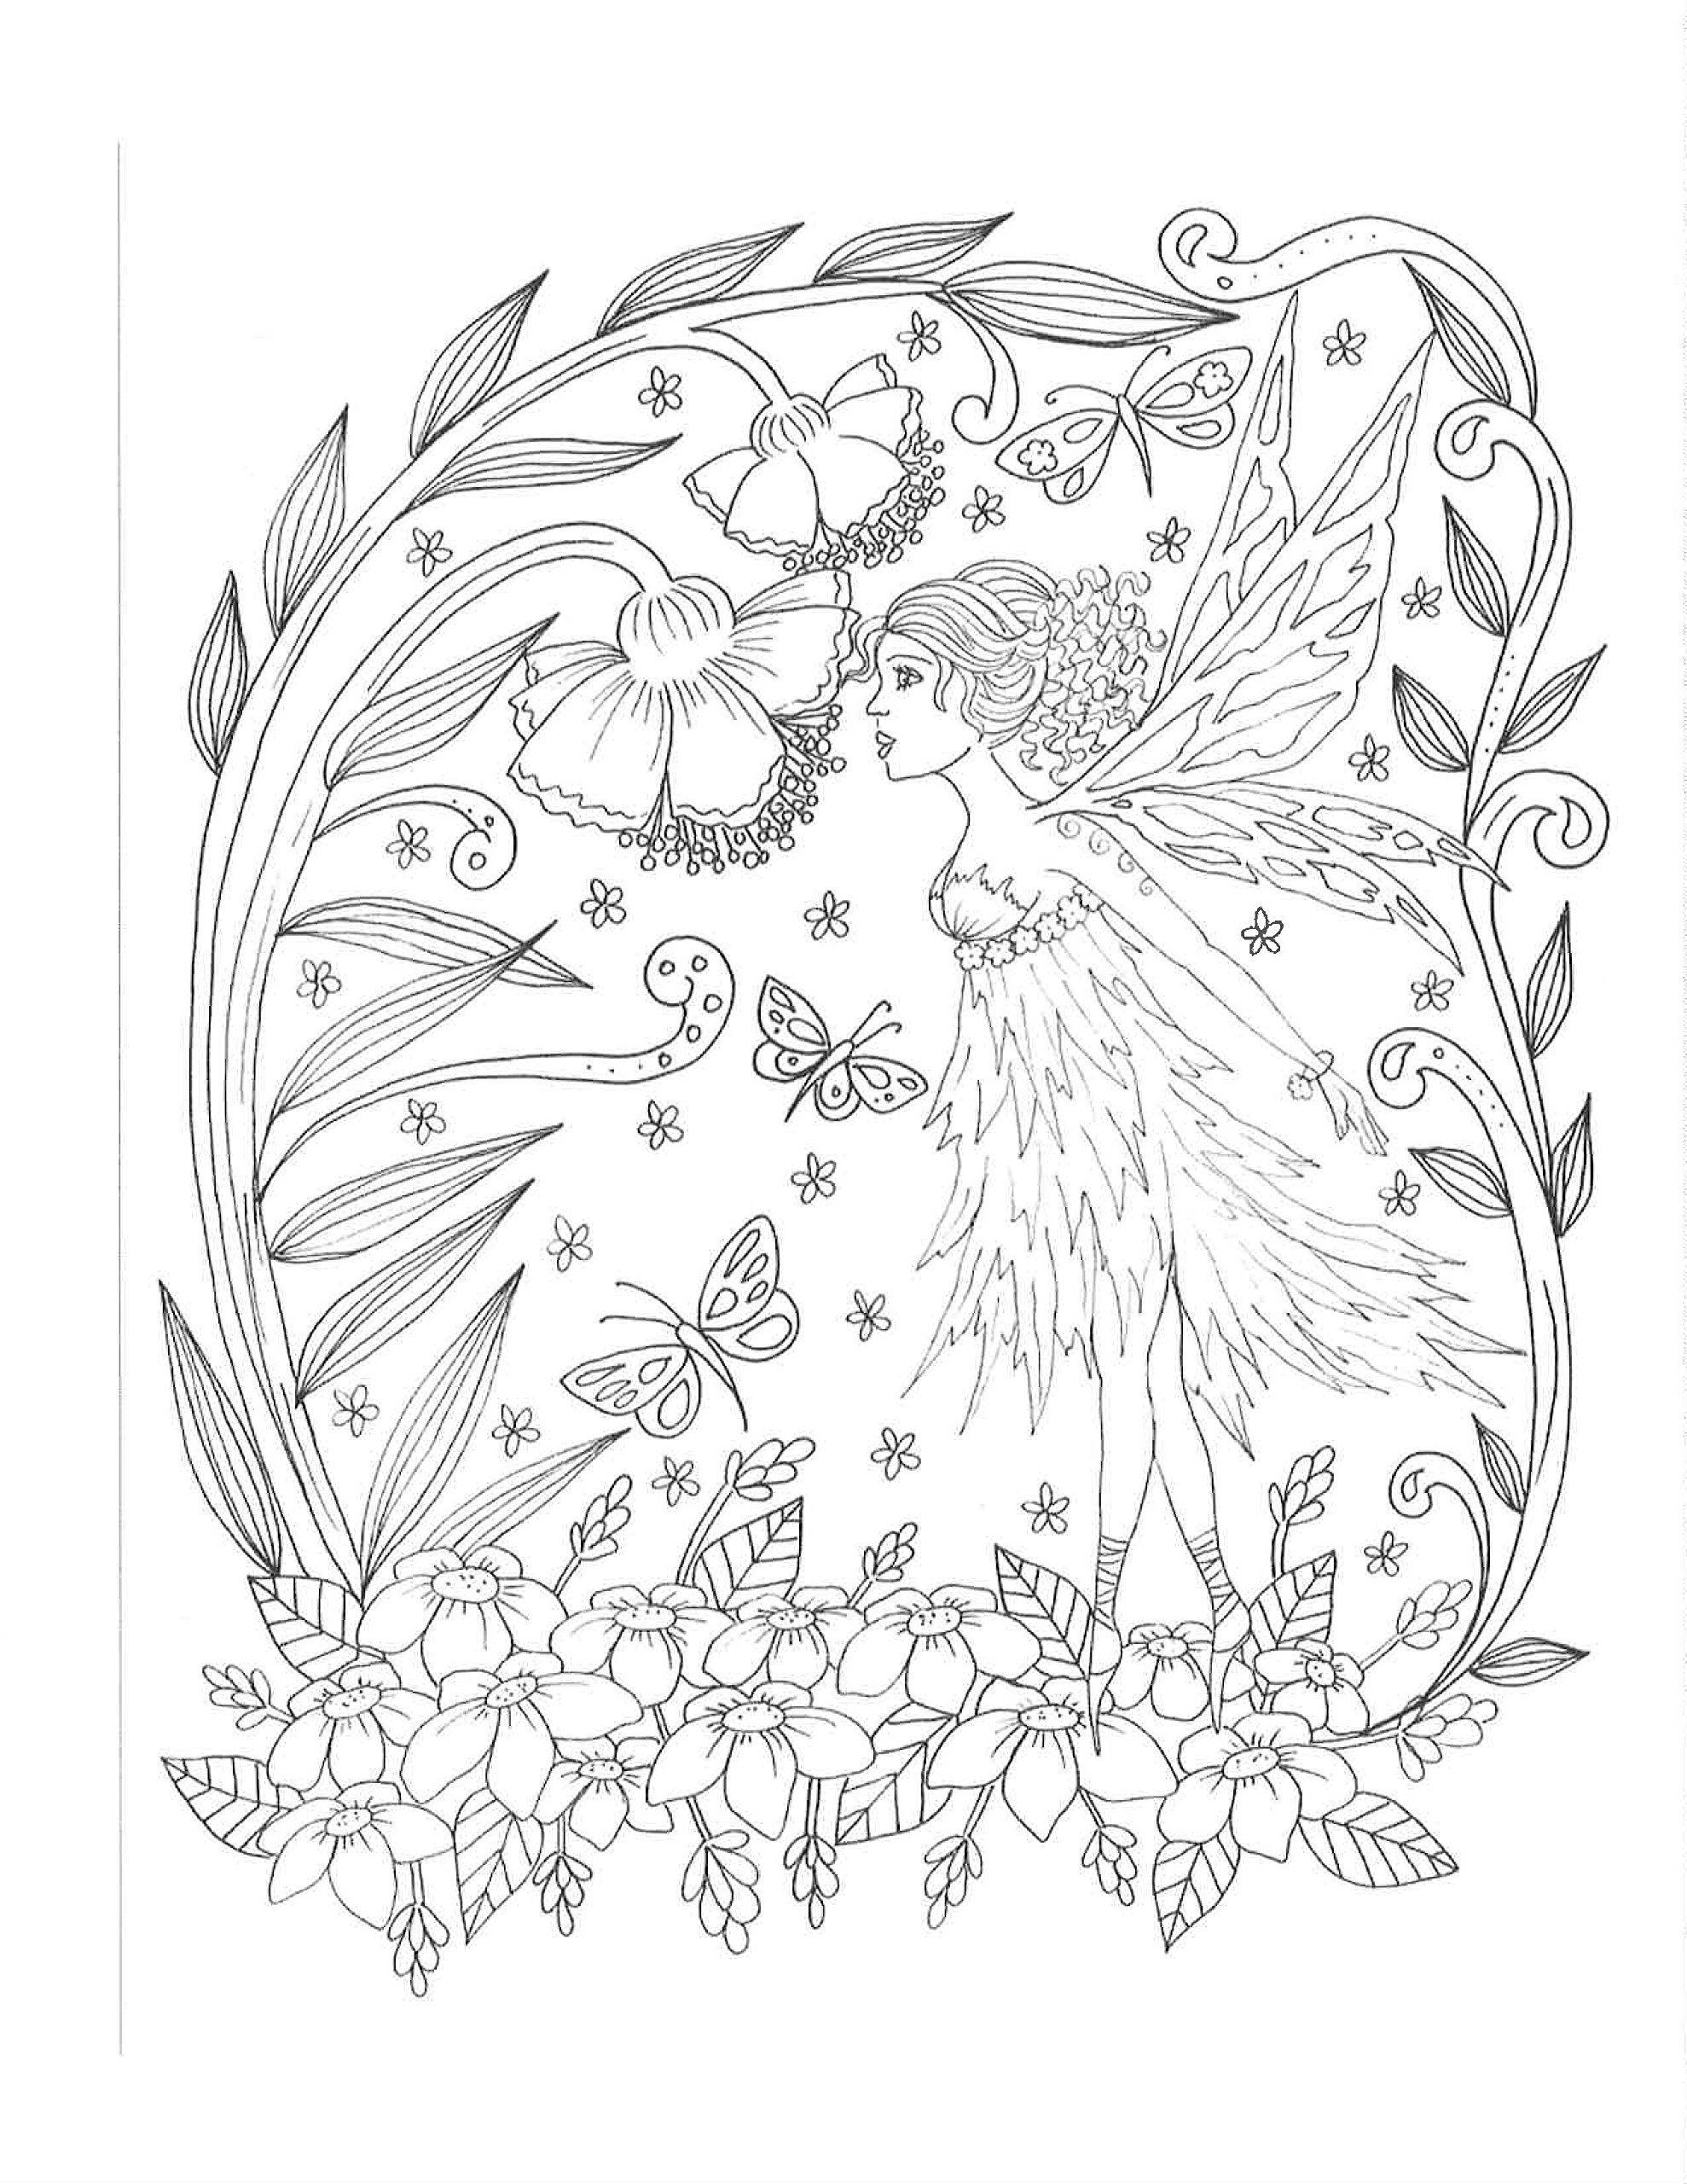 zendoodle coloring magical fairies enchanted pixies to color deborah muller fairies. Black Bedroom Furniture Sets. Home Design Ideas